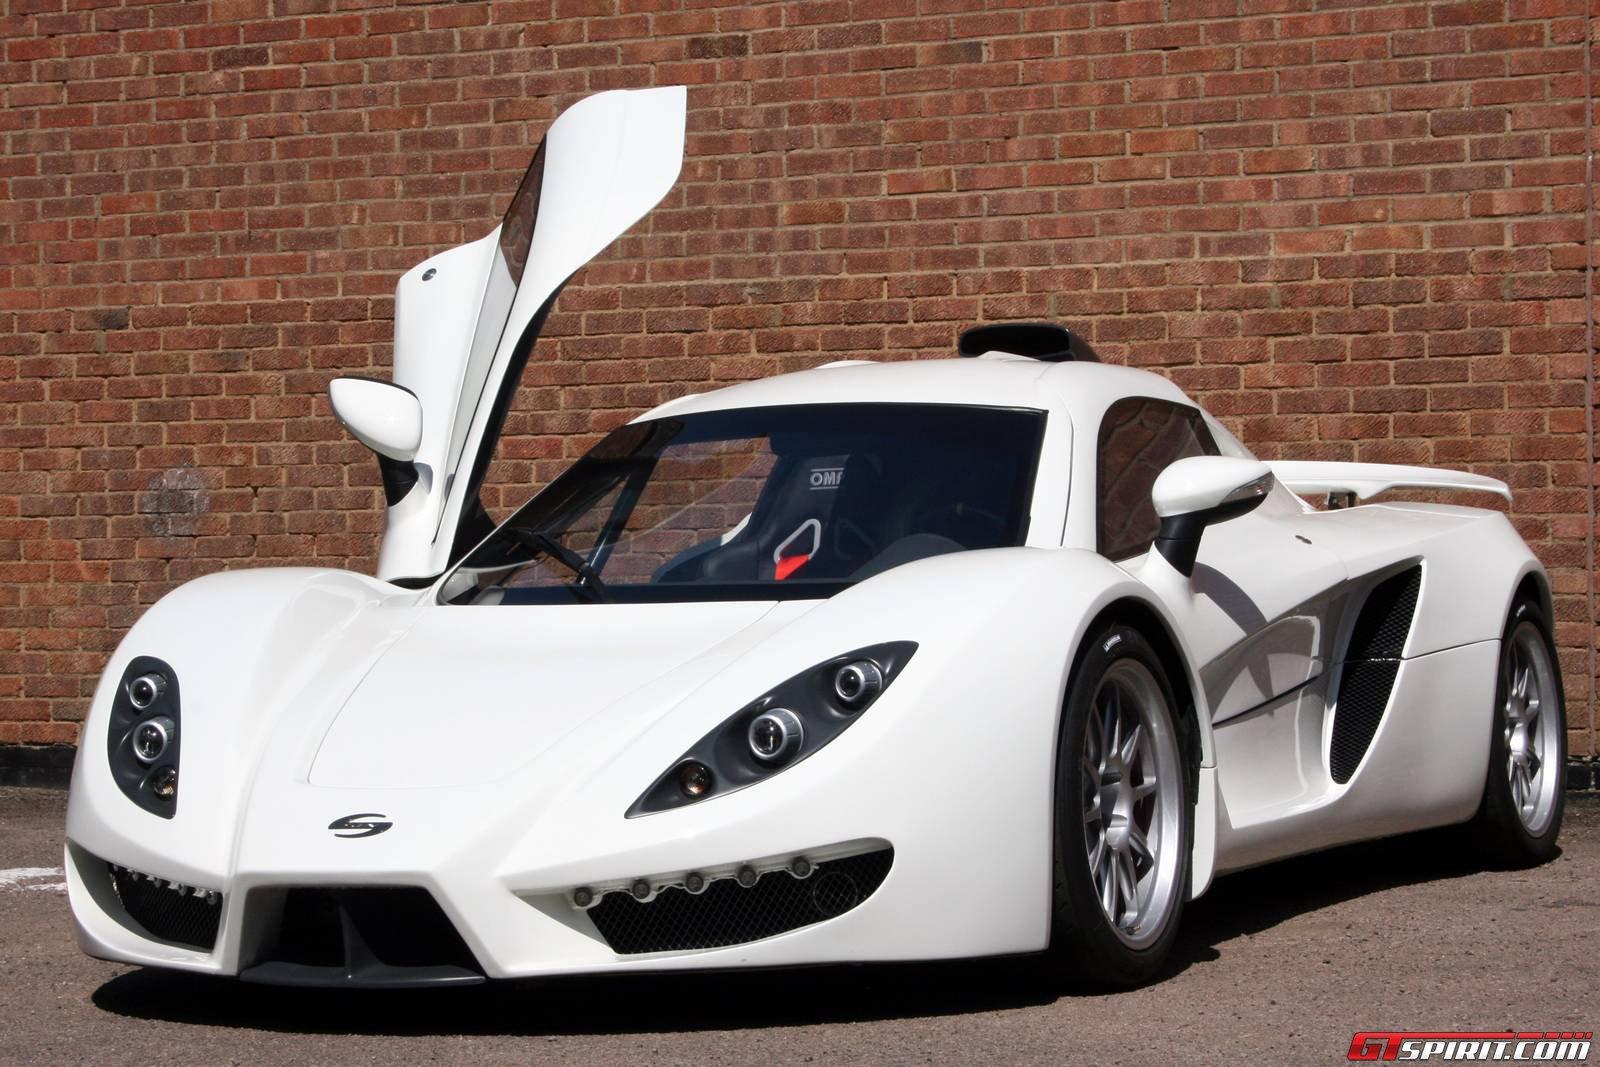 Sports Cars For Sale >> British Sin R1 Sports Car Goes On Sale Gtspirit